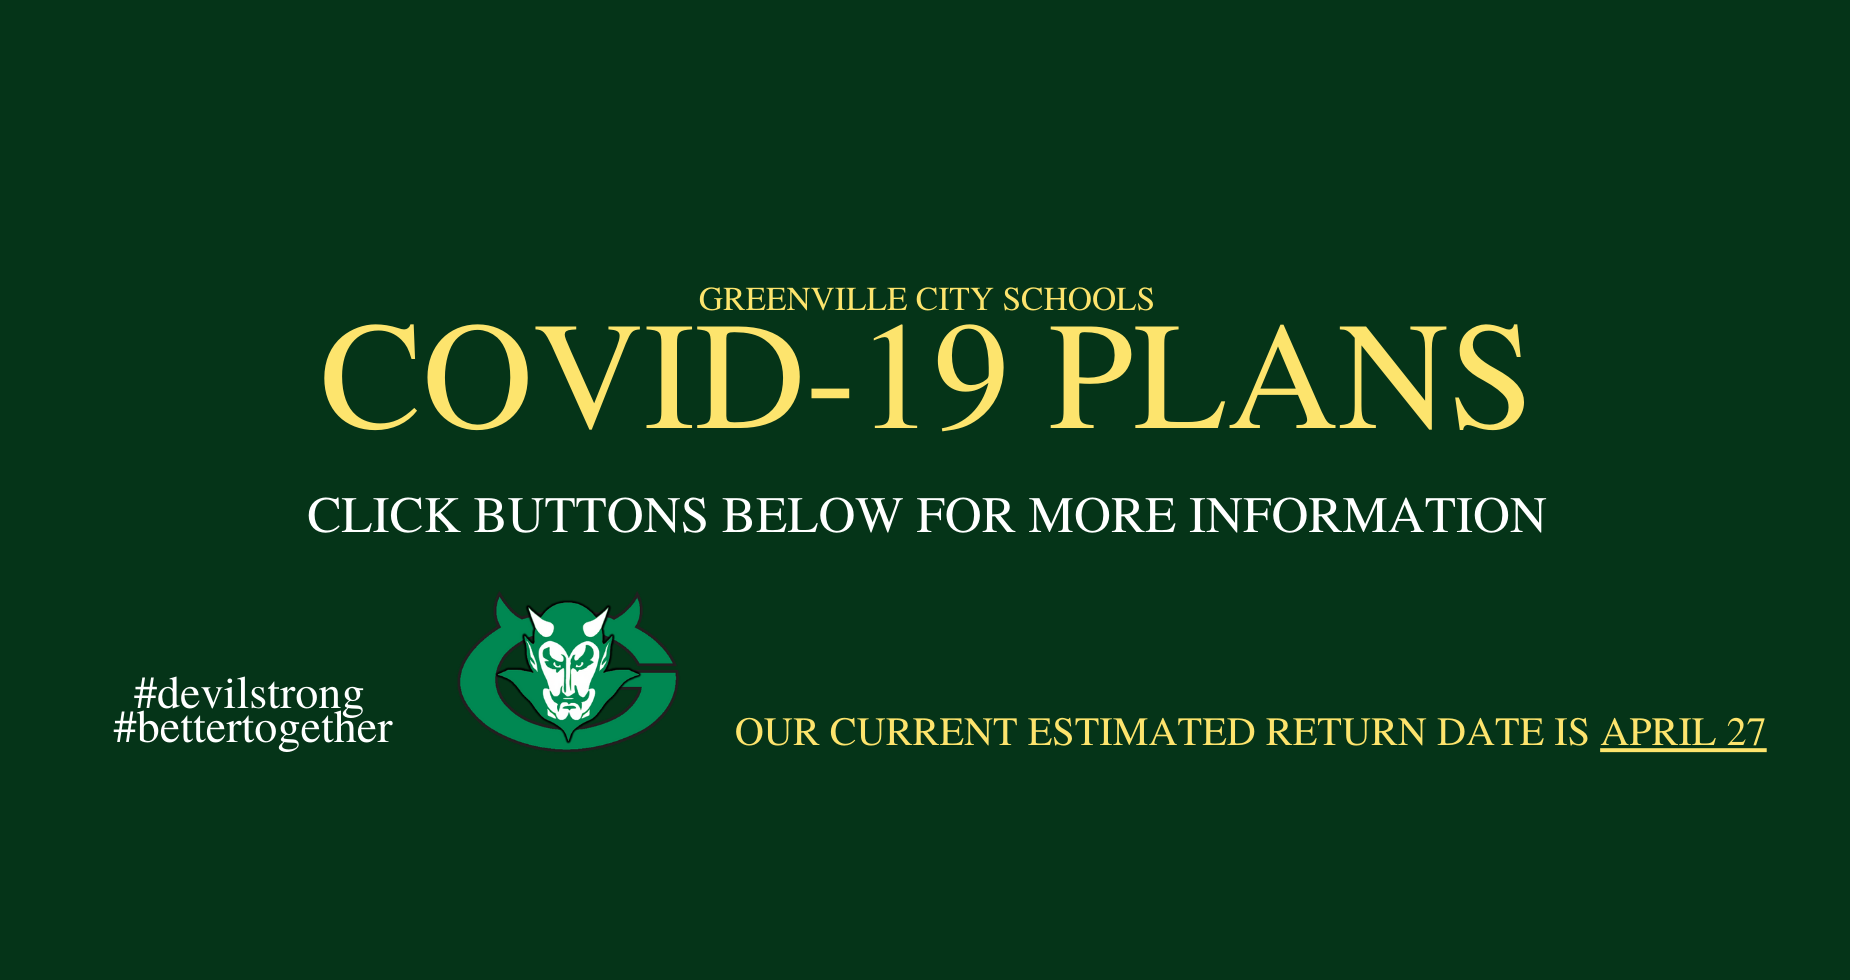 GCS Covid 19 plan